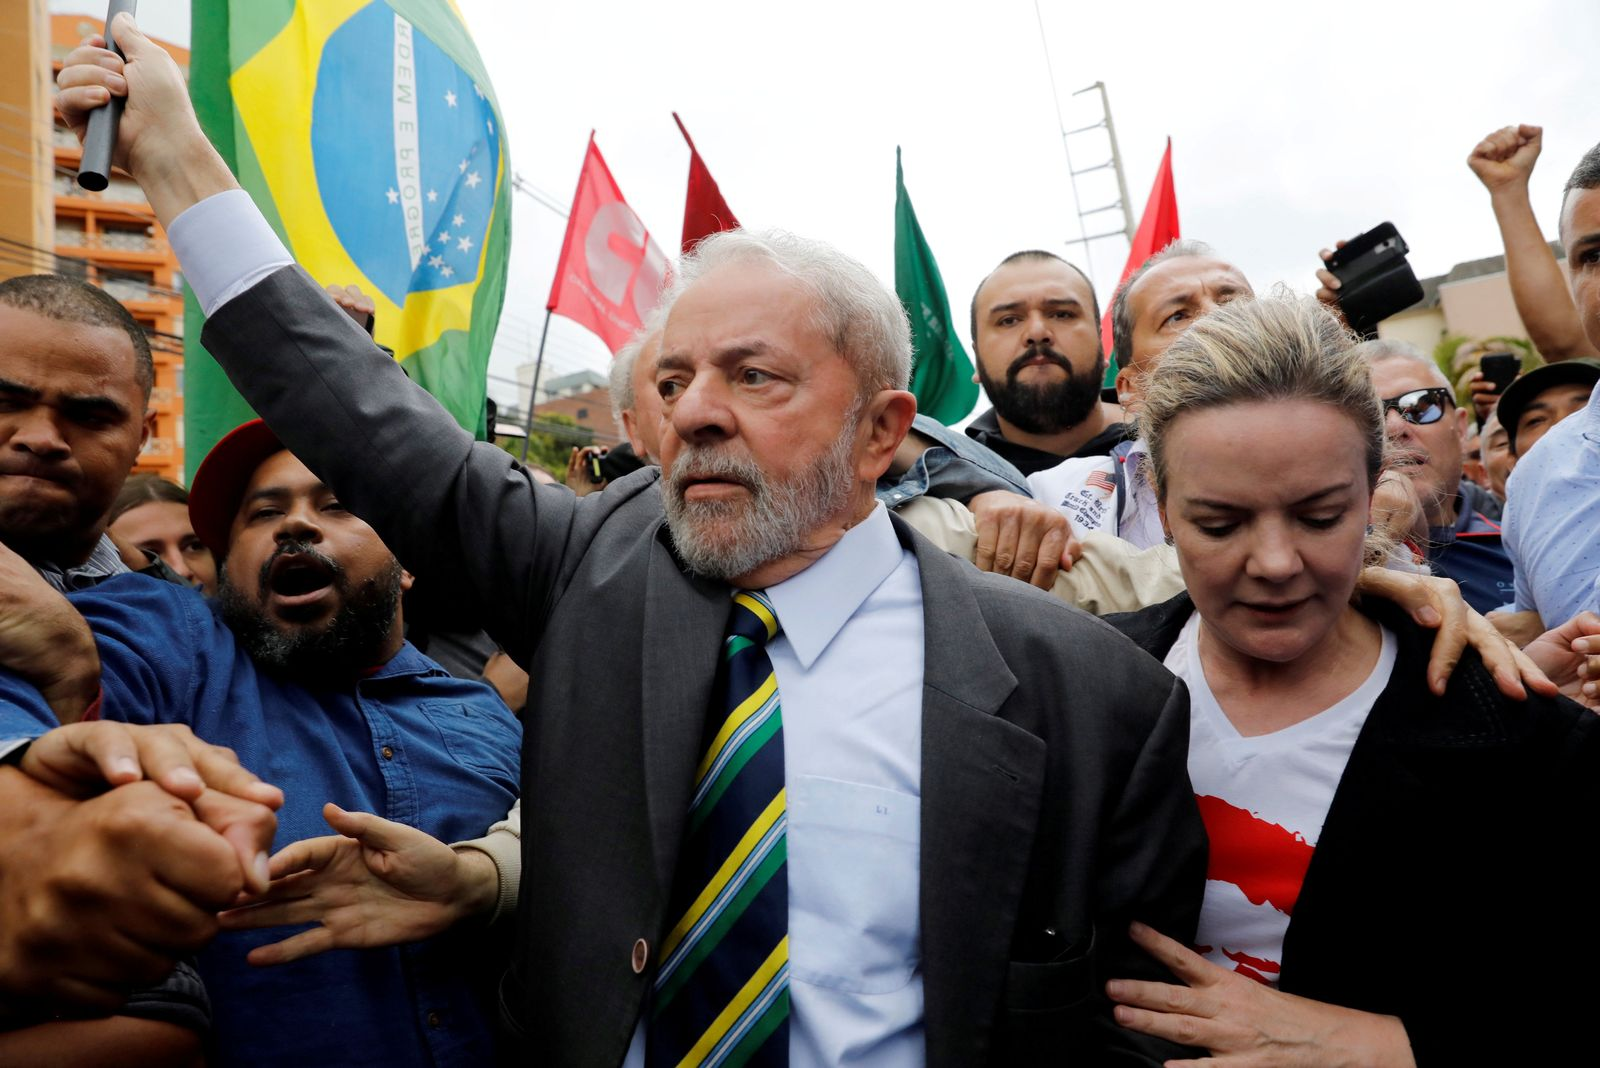 Lula da Silva/ Gleisi Hoffmann